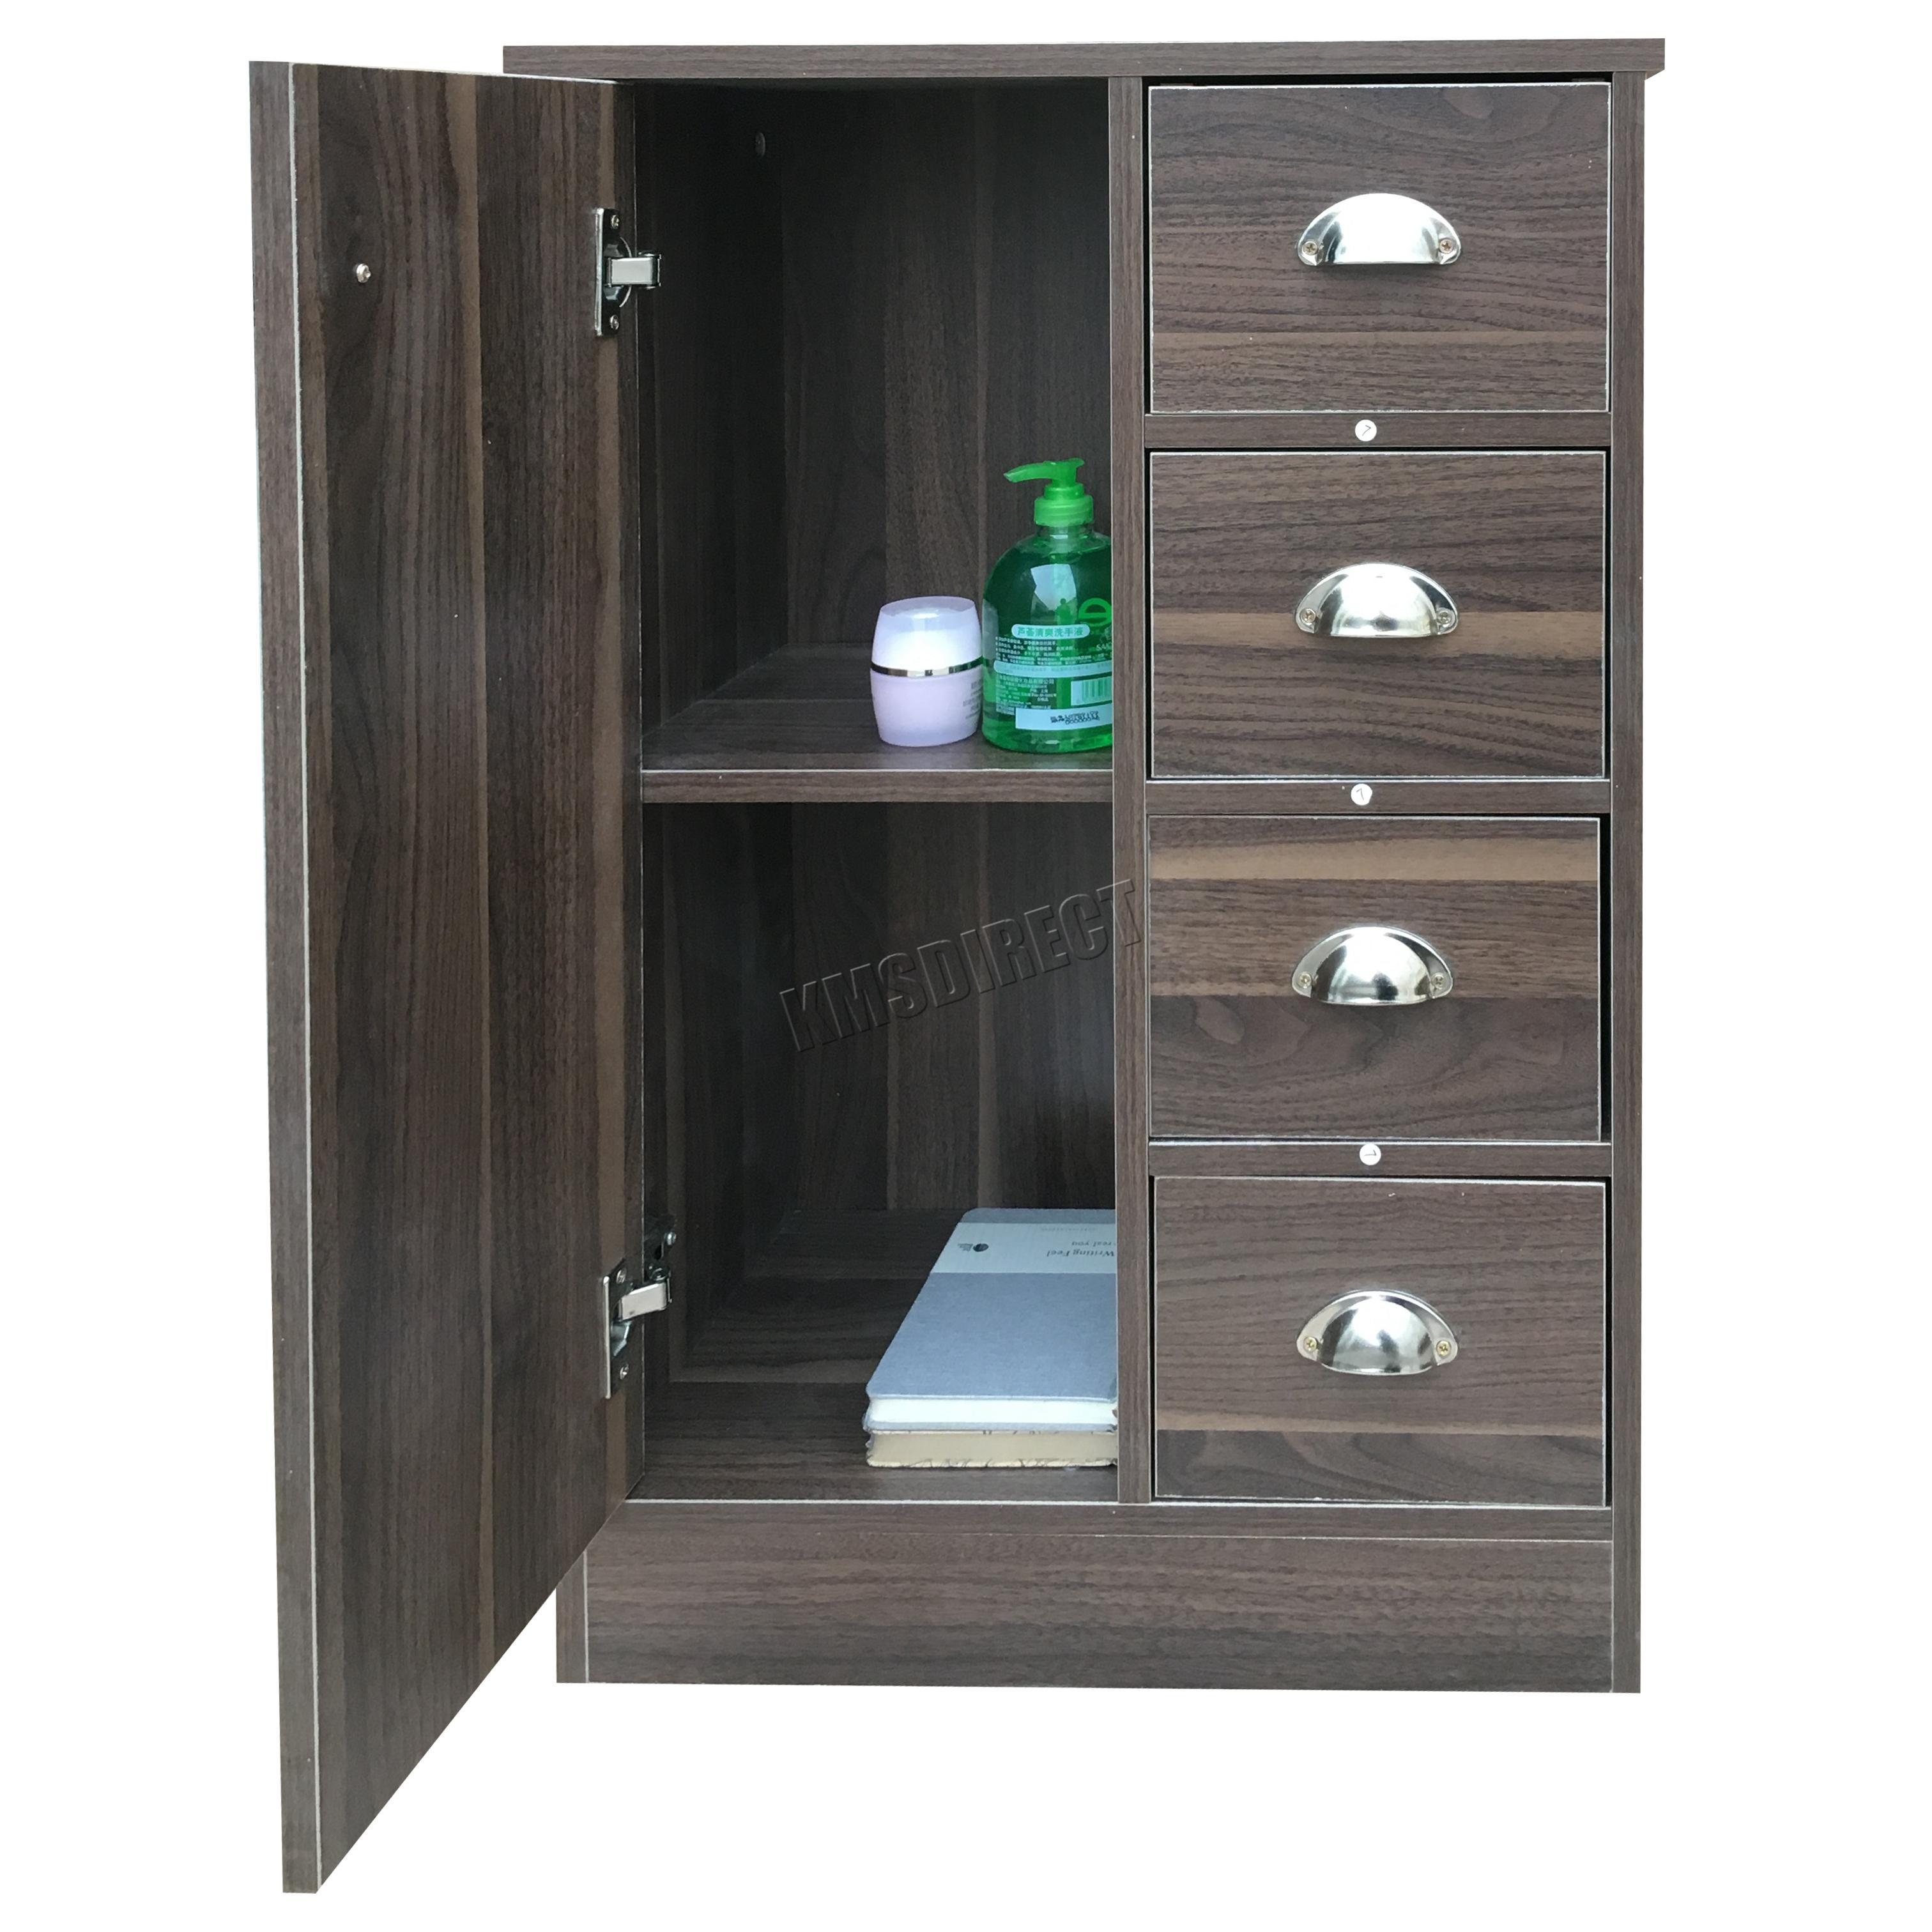 FoxHunter 4 Drawer 2 Shelves Bathroom Storage Cupboard